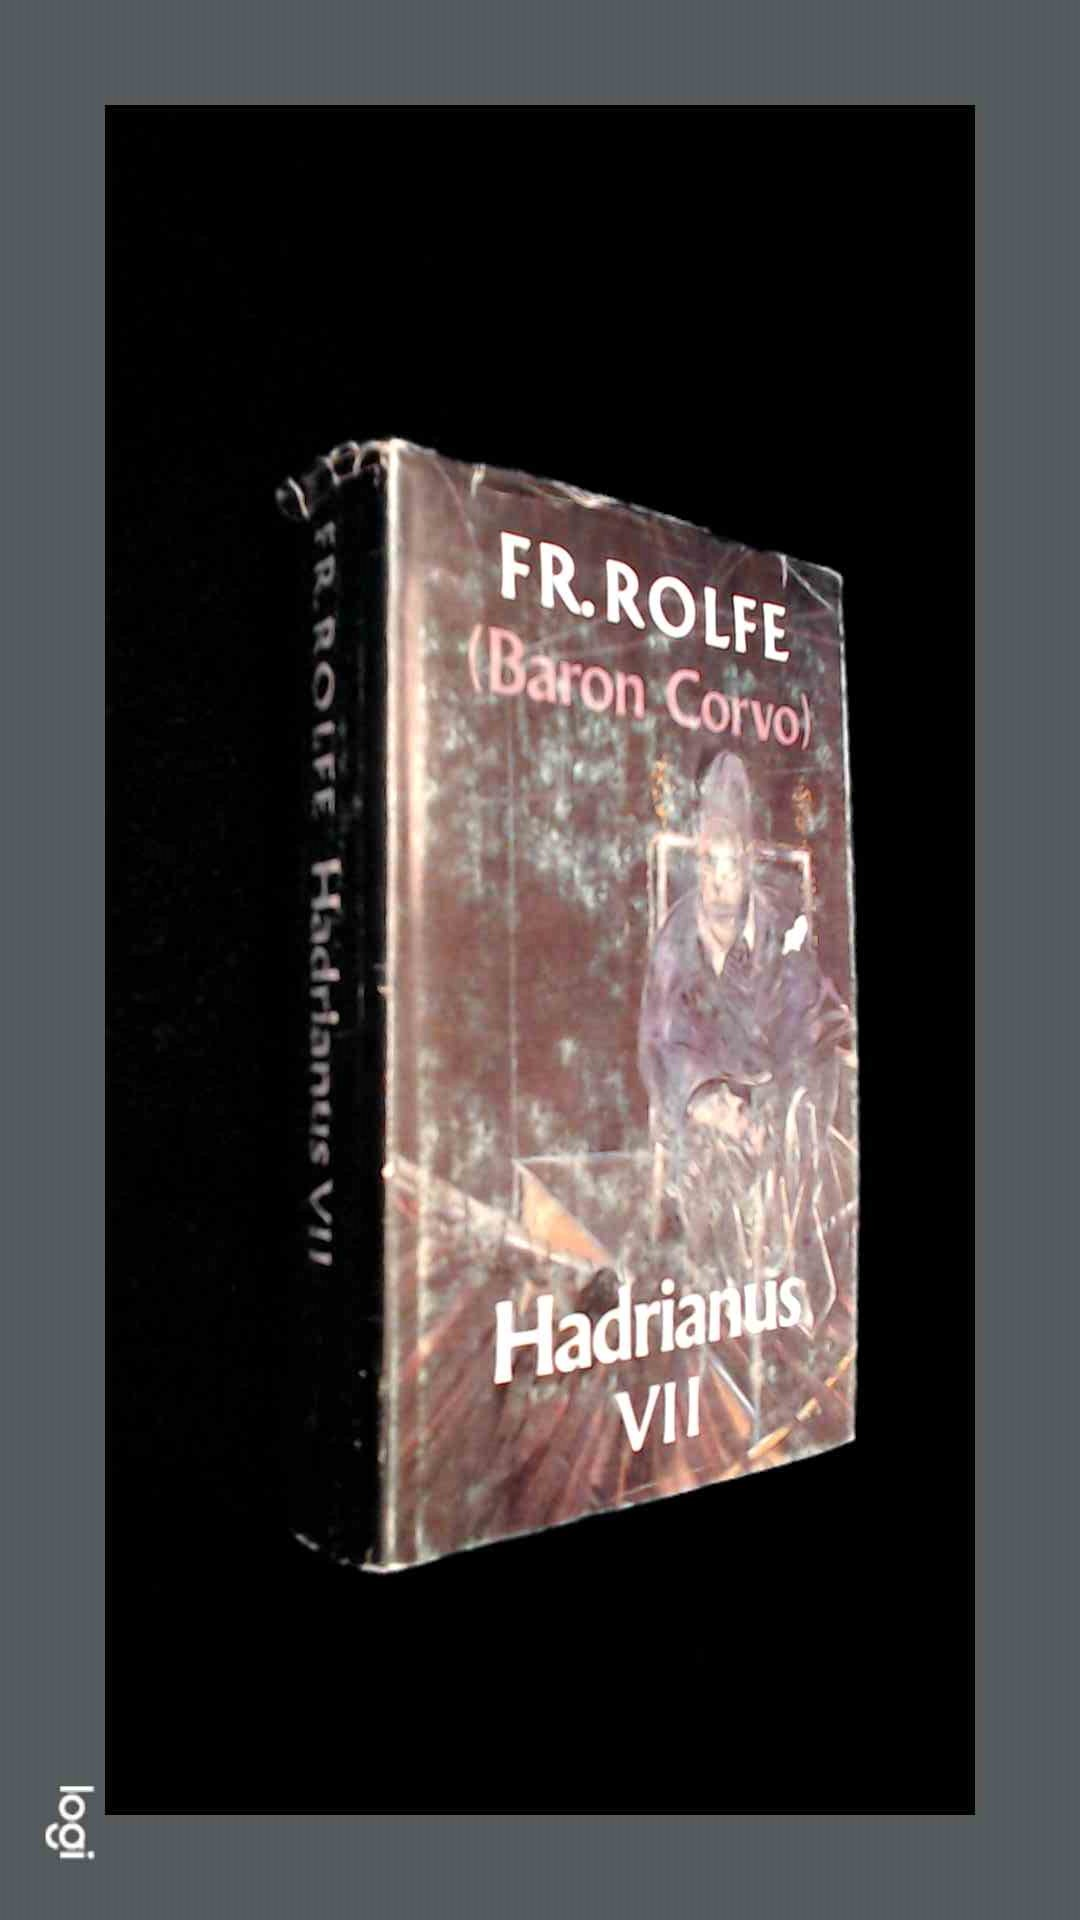 ROLFE, FR. (FREDERICK BARON CORVE) - Hadrianus VII